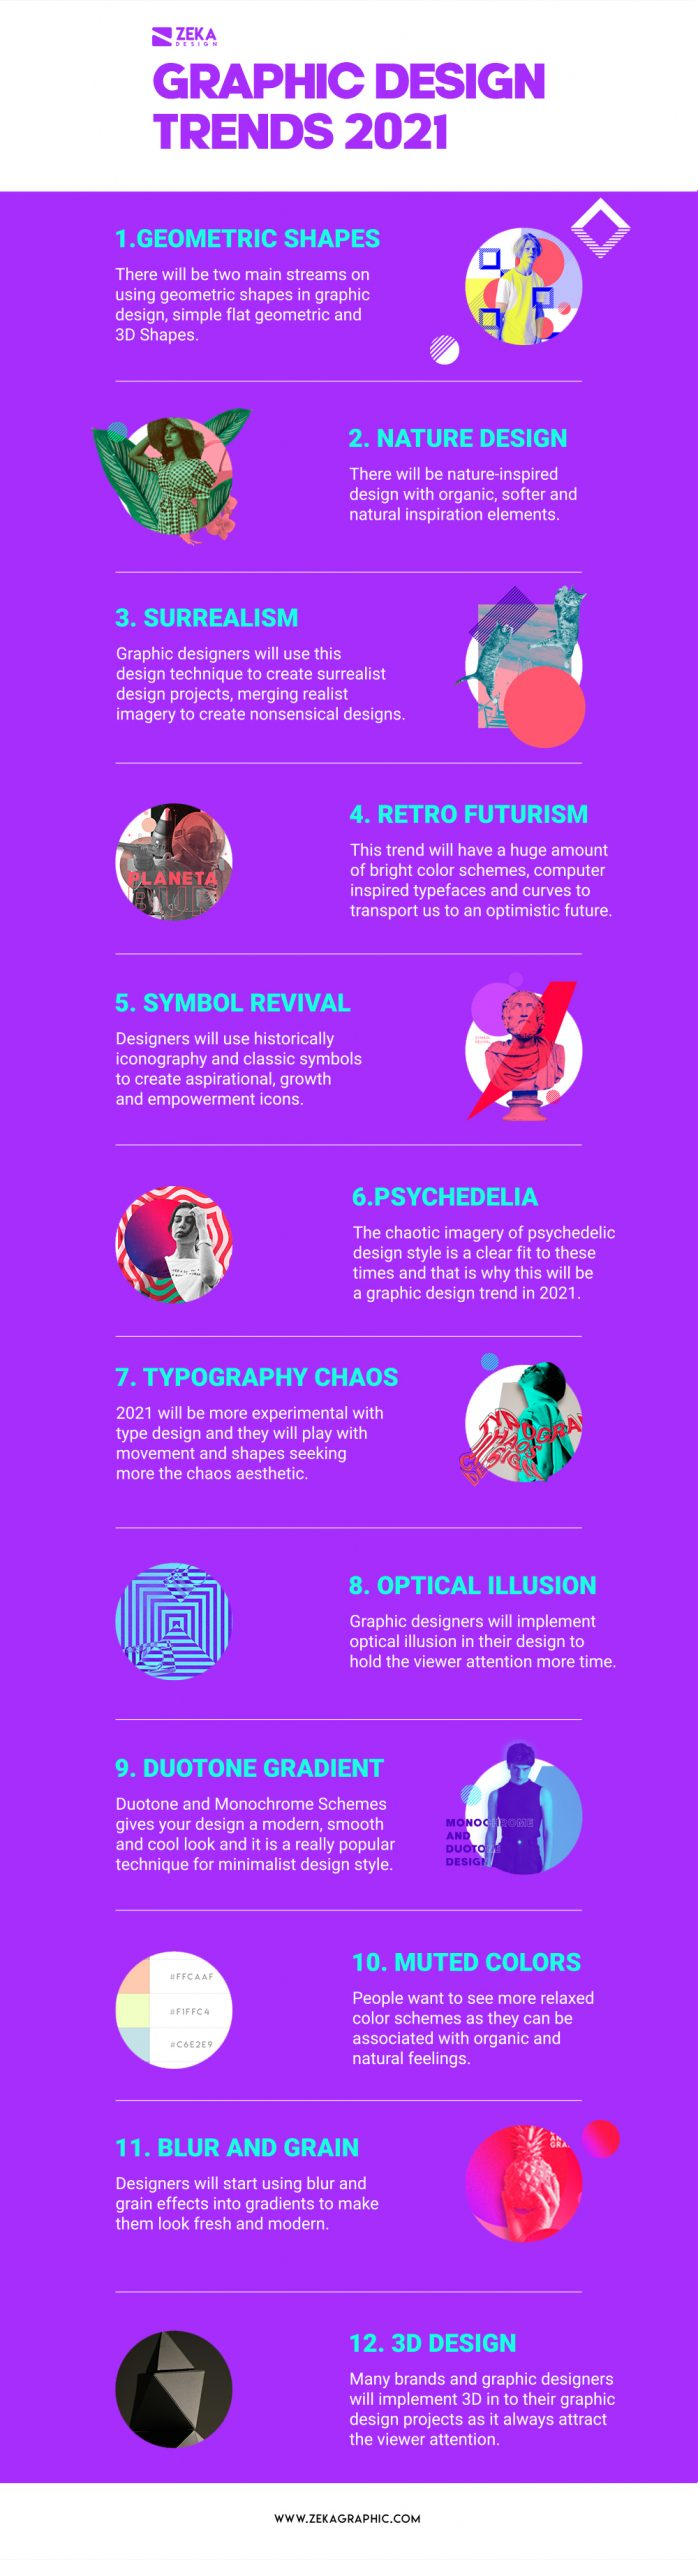 Graphic Design Trends 2021 Infographic